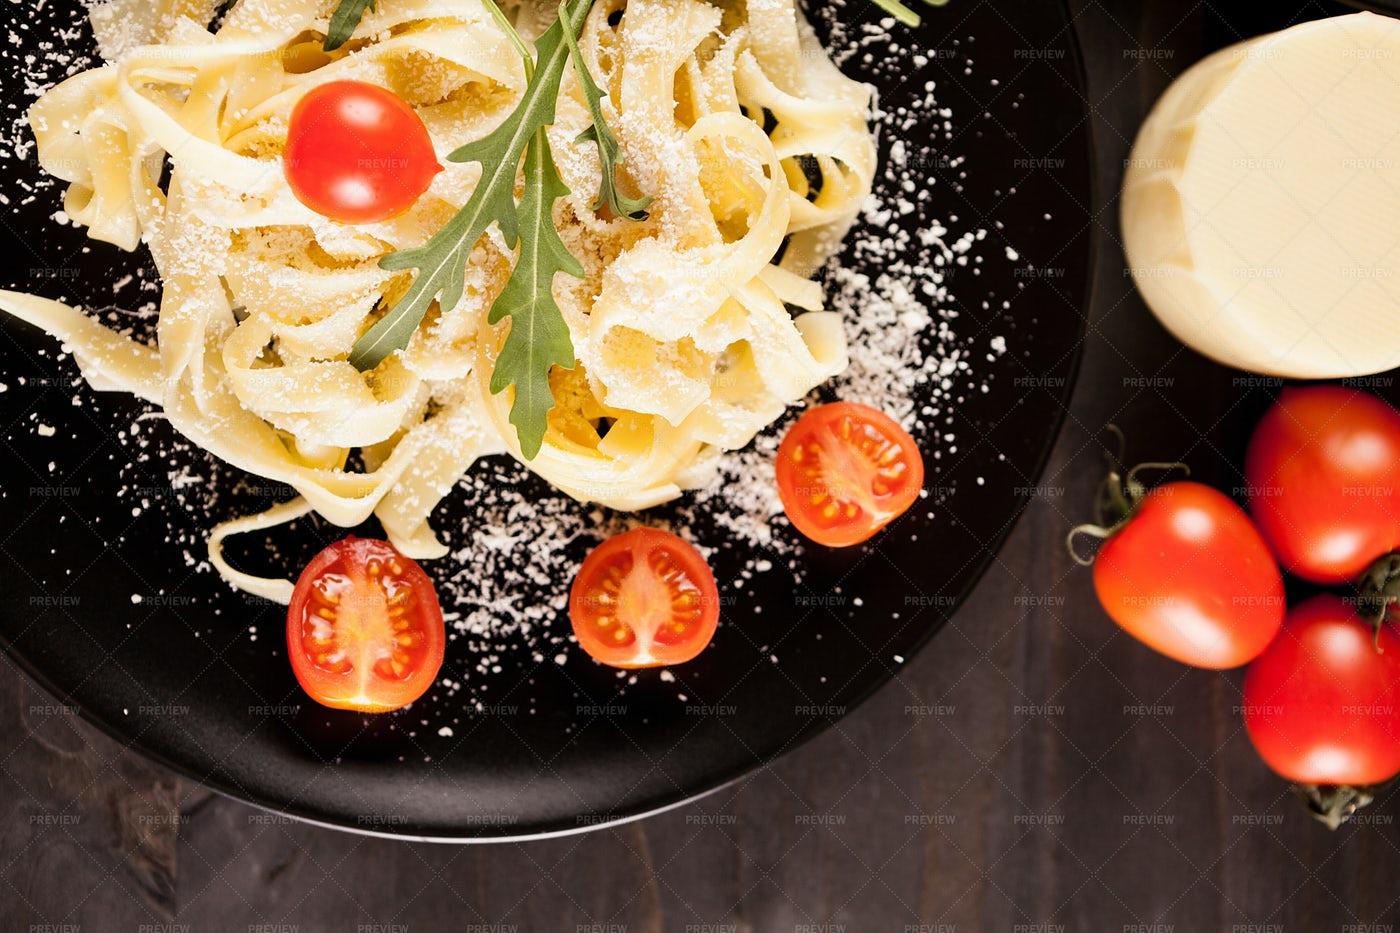 Italian Meal: Stock Photos